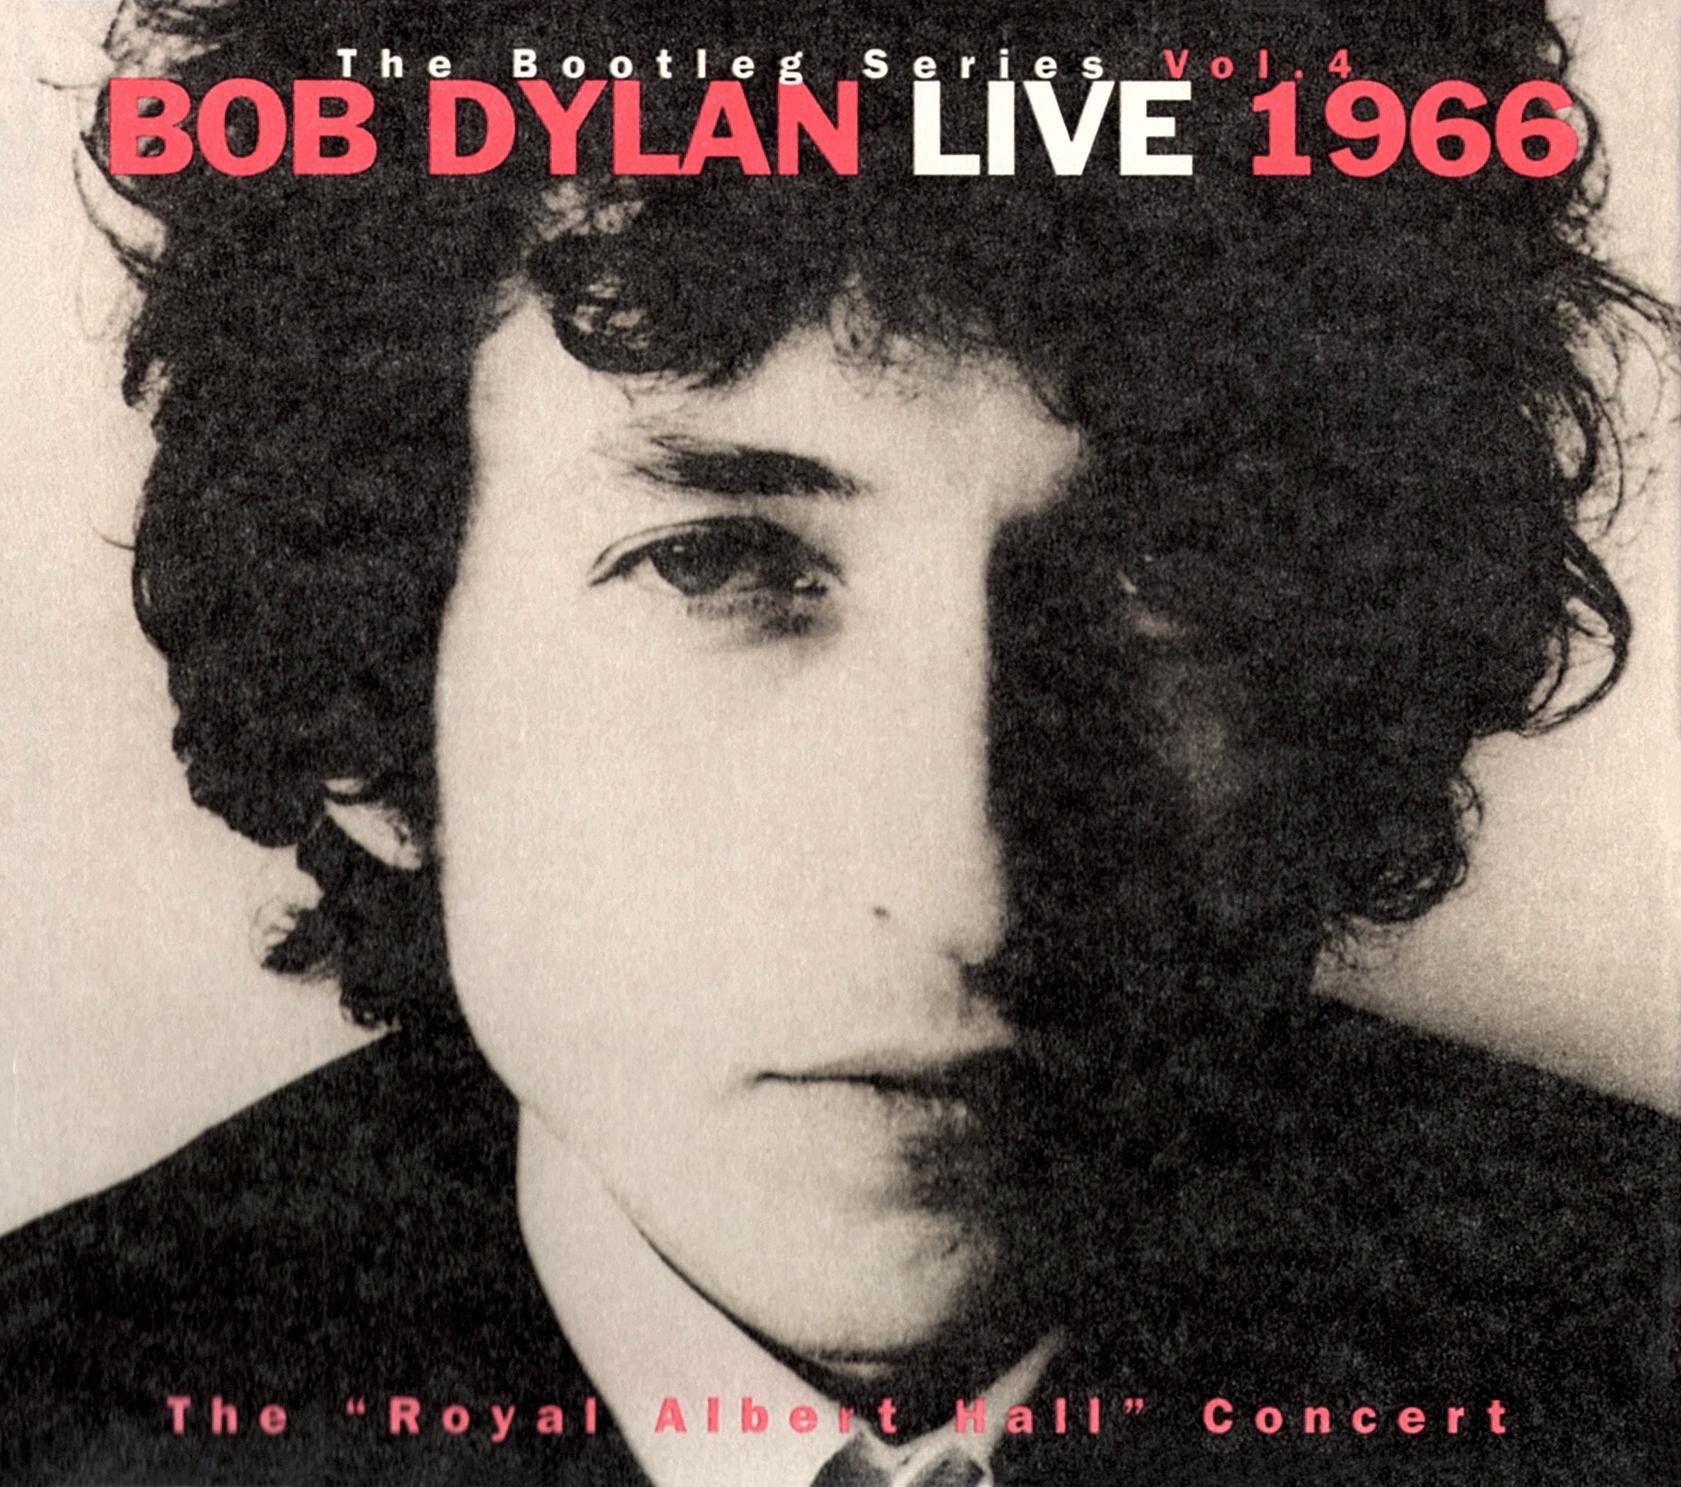 "Bob Dylan (ボブ・ディラン)『the bootleg series, volumes 4 BOB DYLAN LIVE 1966, The ""Royal Albert Hall"" Concert (ロイヤル・アルバート・ホール)』(1998年11月6日発売)"